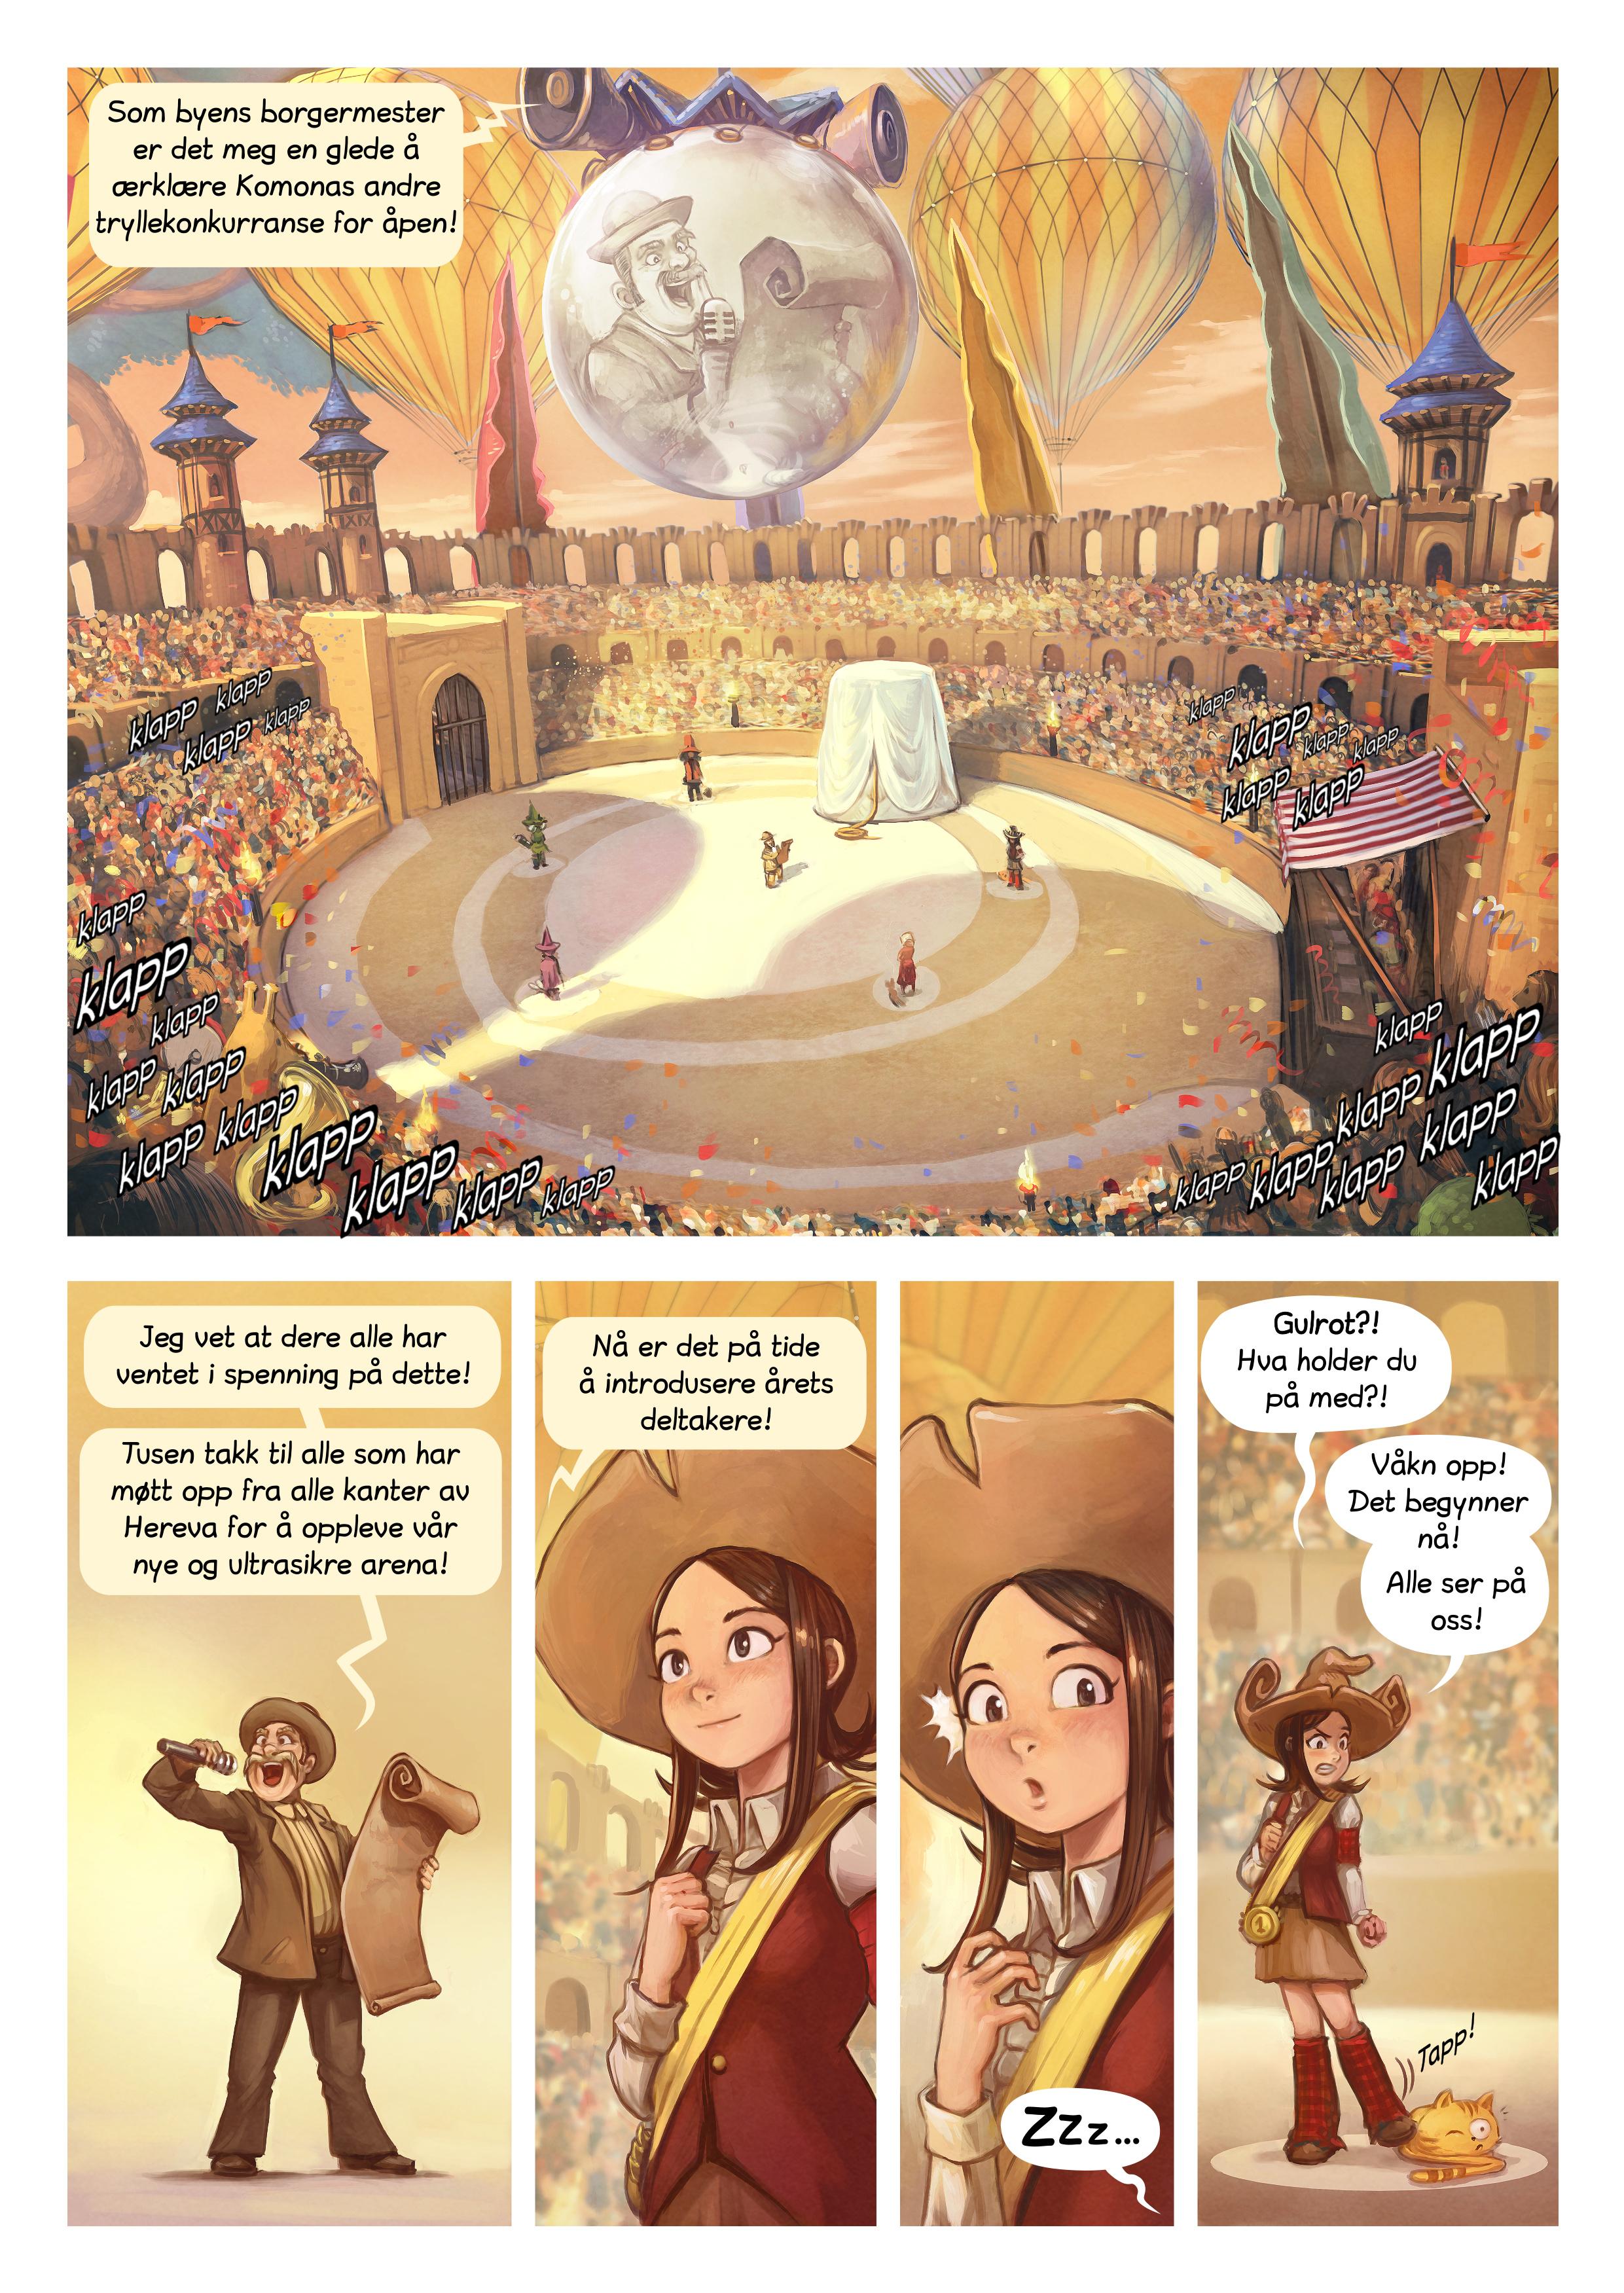 Episode 21: Tryllekonkurransen, Page 3